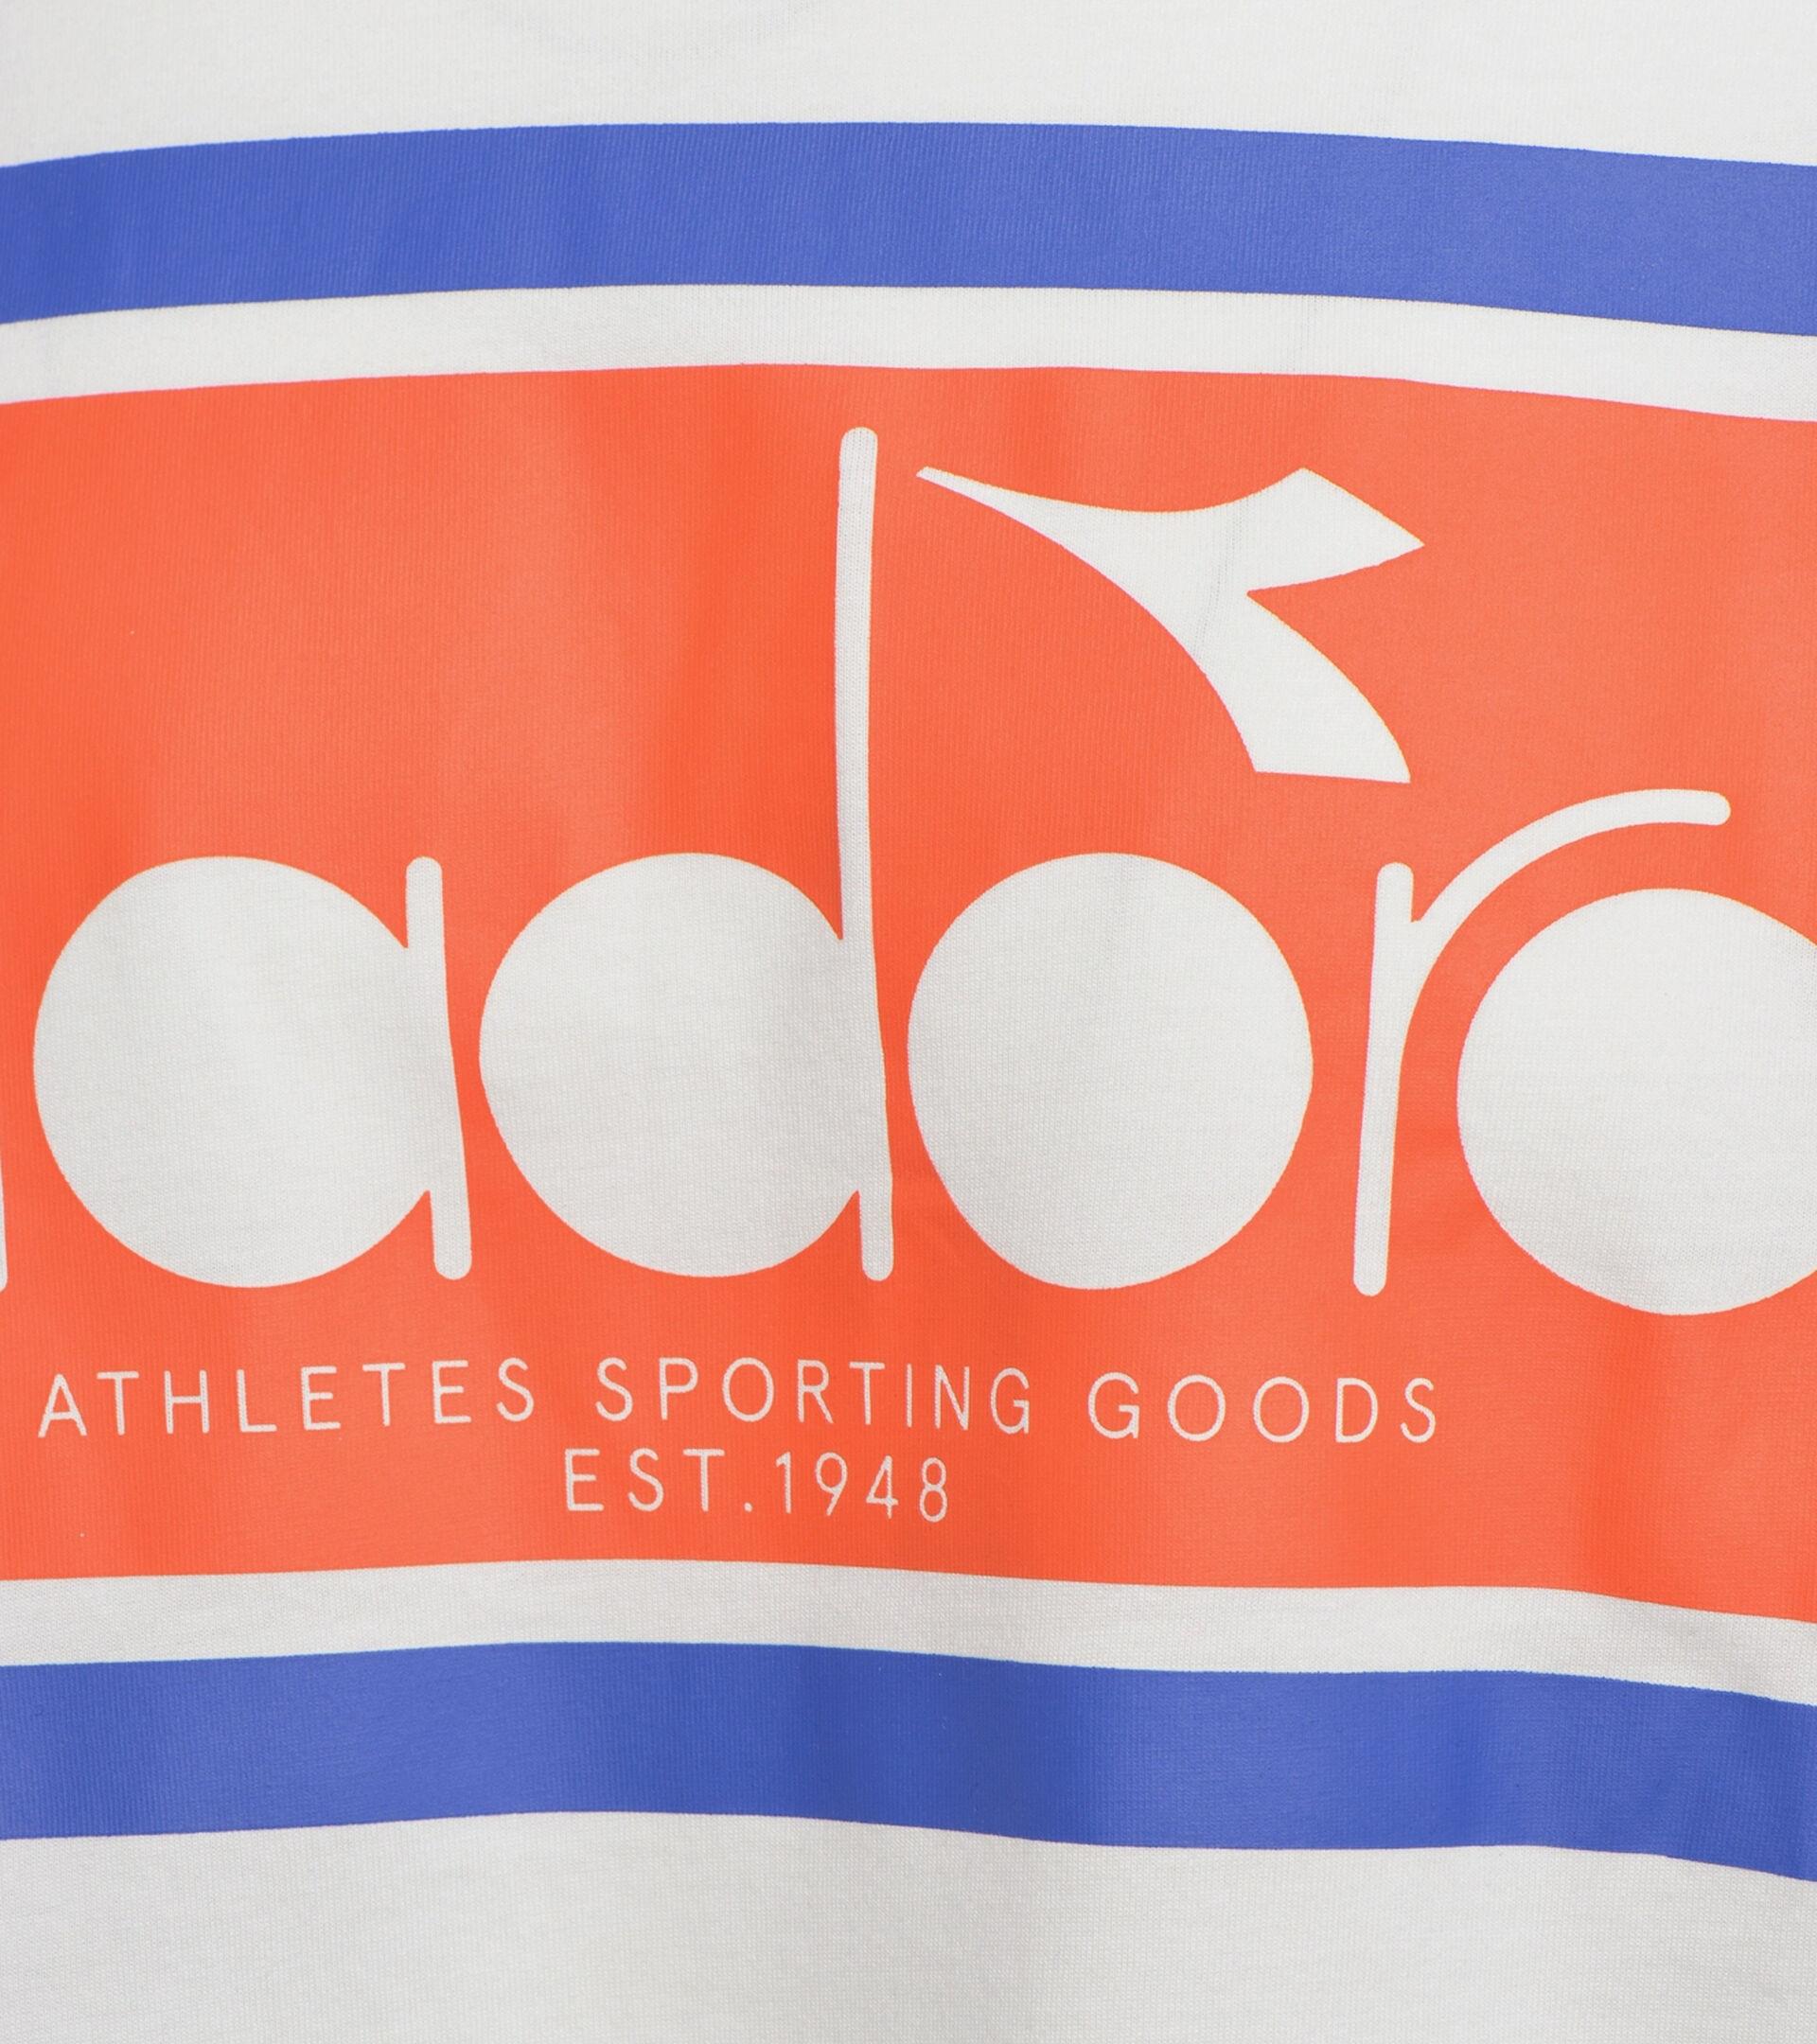 Apparel Sportswear UOMO SS T-SHIRT SPECTRA OC ARANCIATA/BIANCO LATTE Diadora